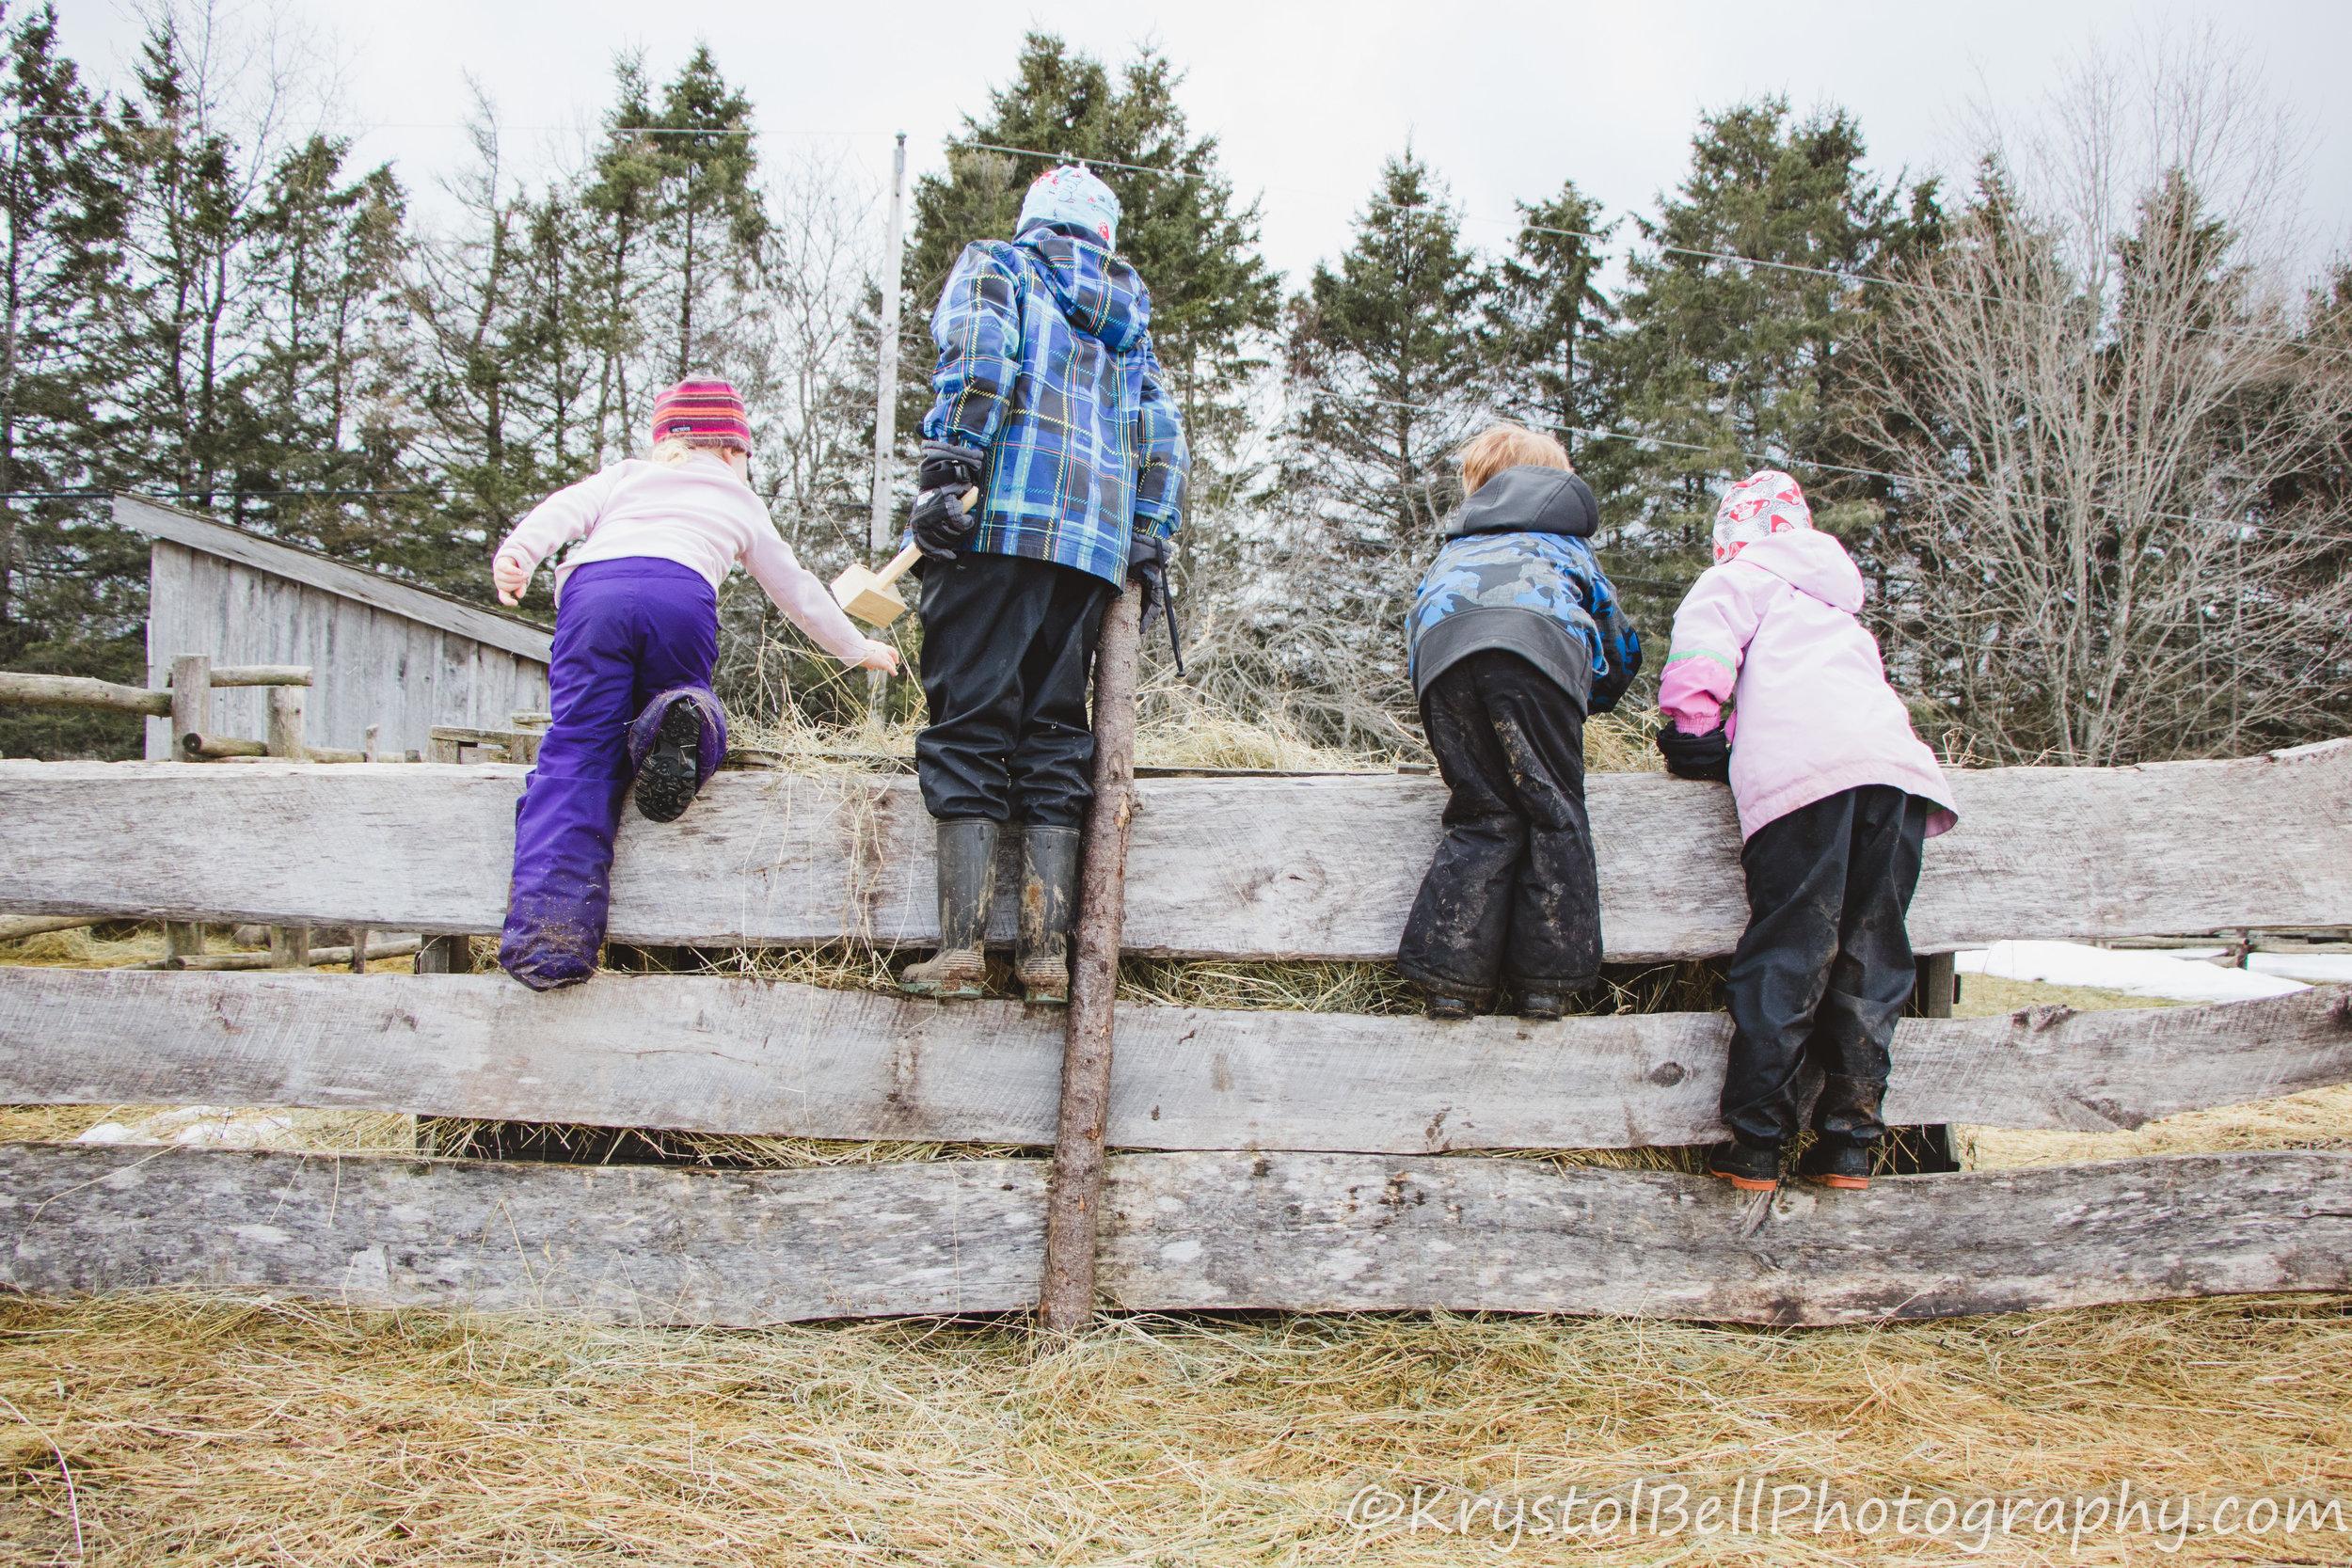 Braegha, Samuel, Teghan, and Isabelle visiting the sheep.